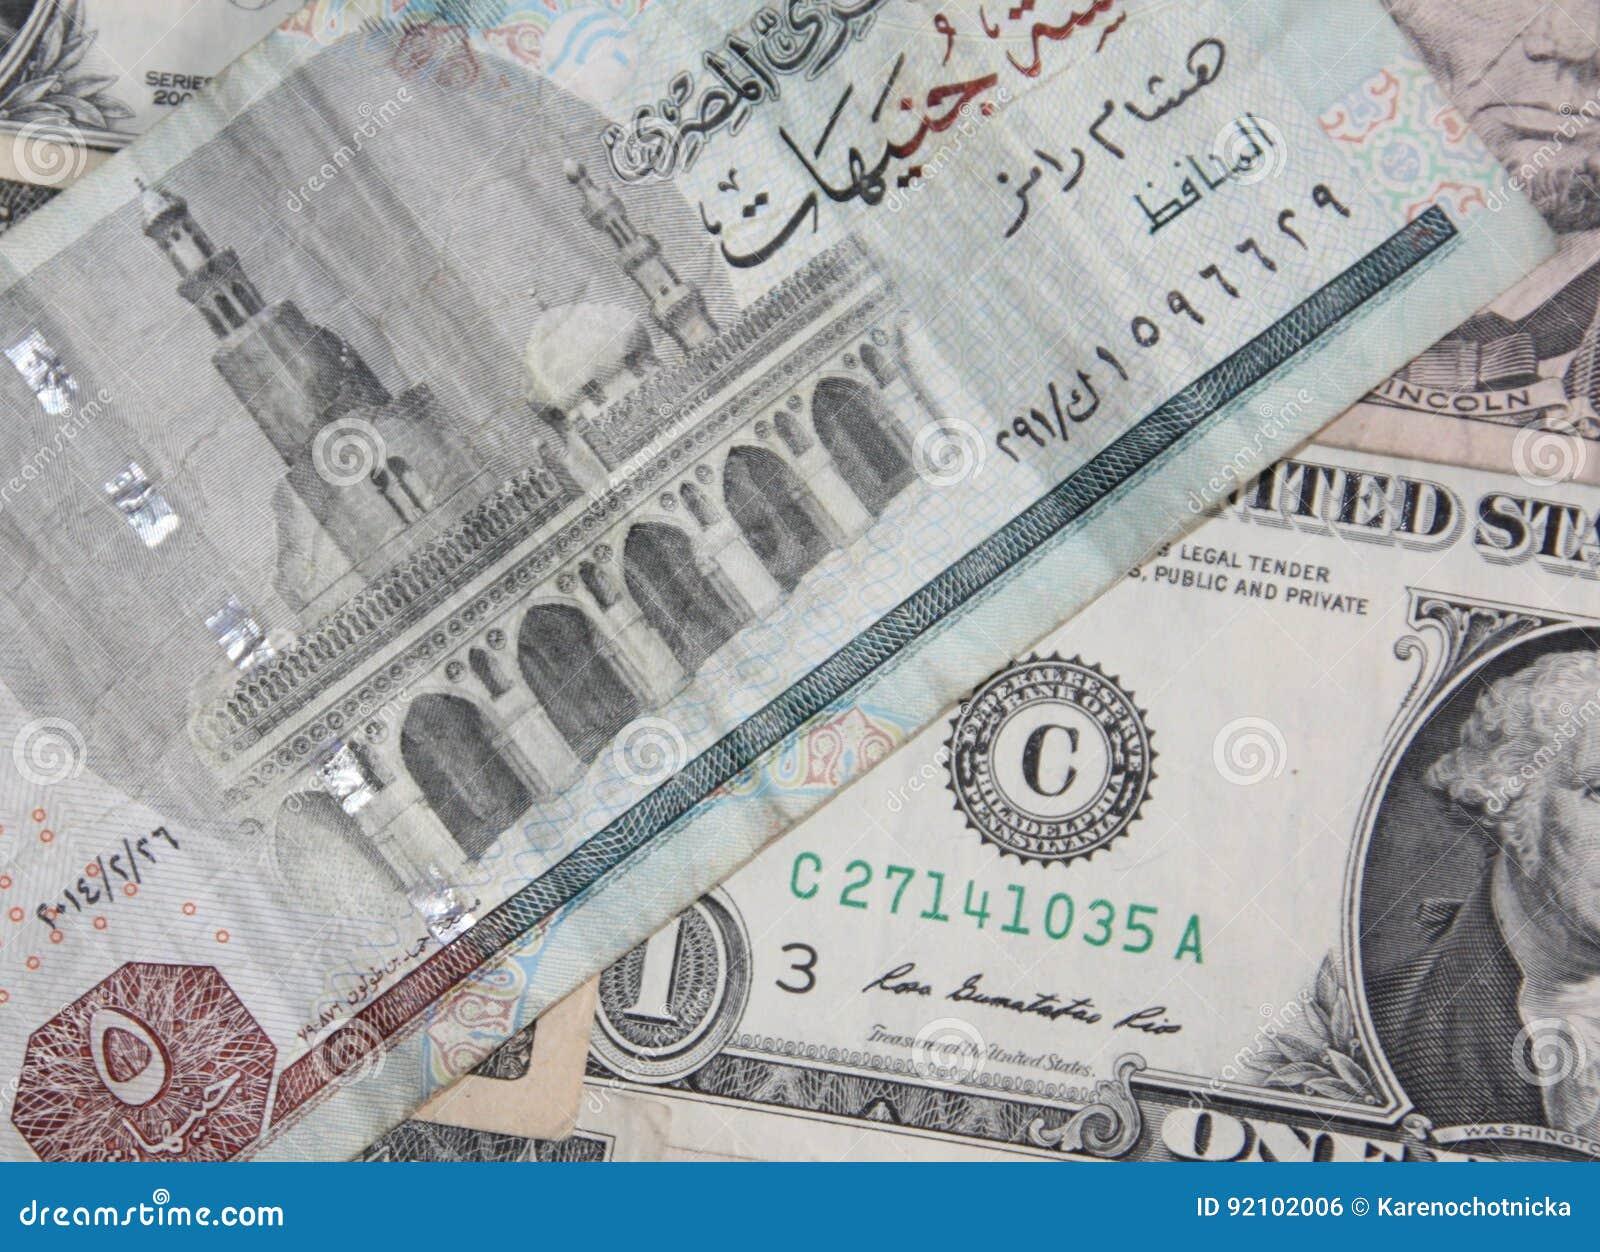 Us Dollar Versus Egyptian Pound Stock Photo Image Of